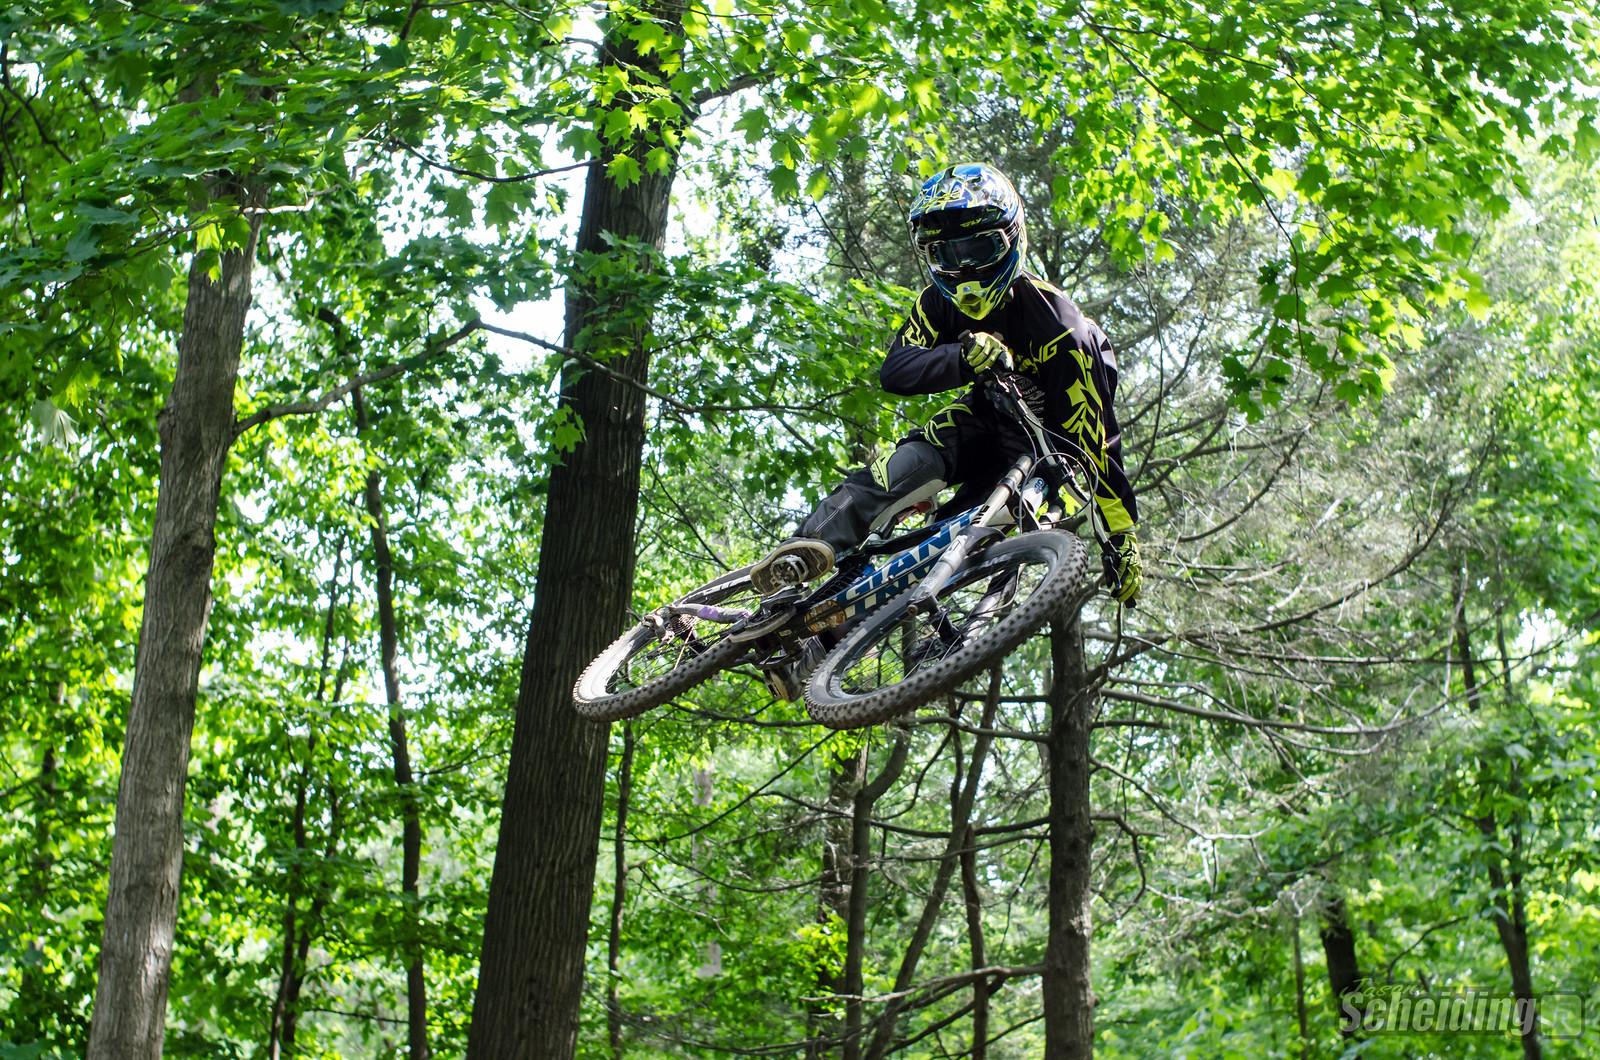 DSC 9267 - JasonScheiding - Mountain Biking Pictures - Vital MTB